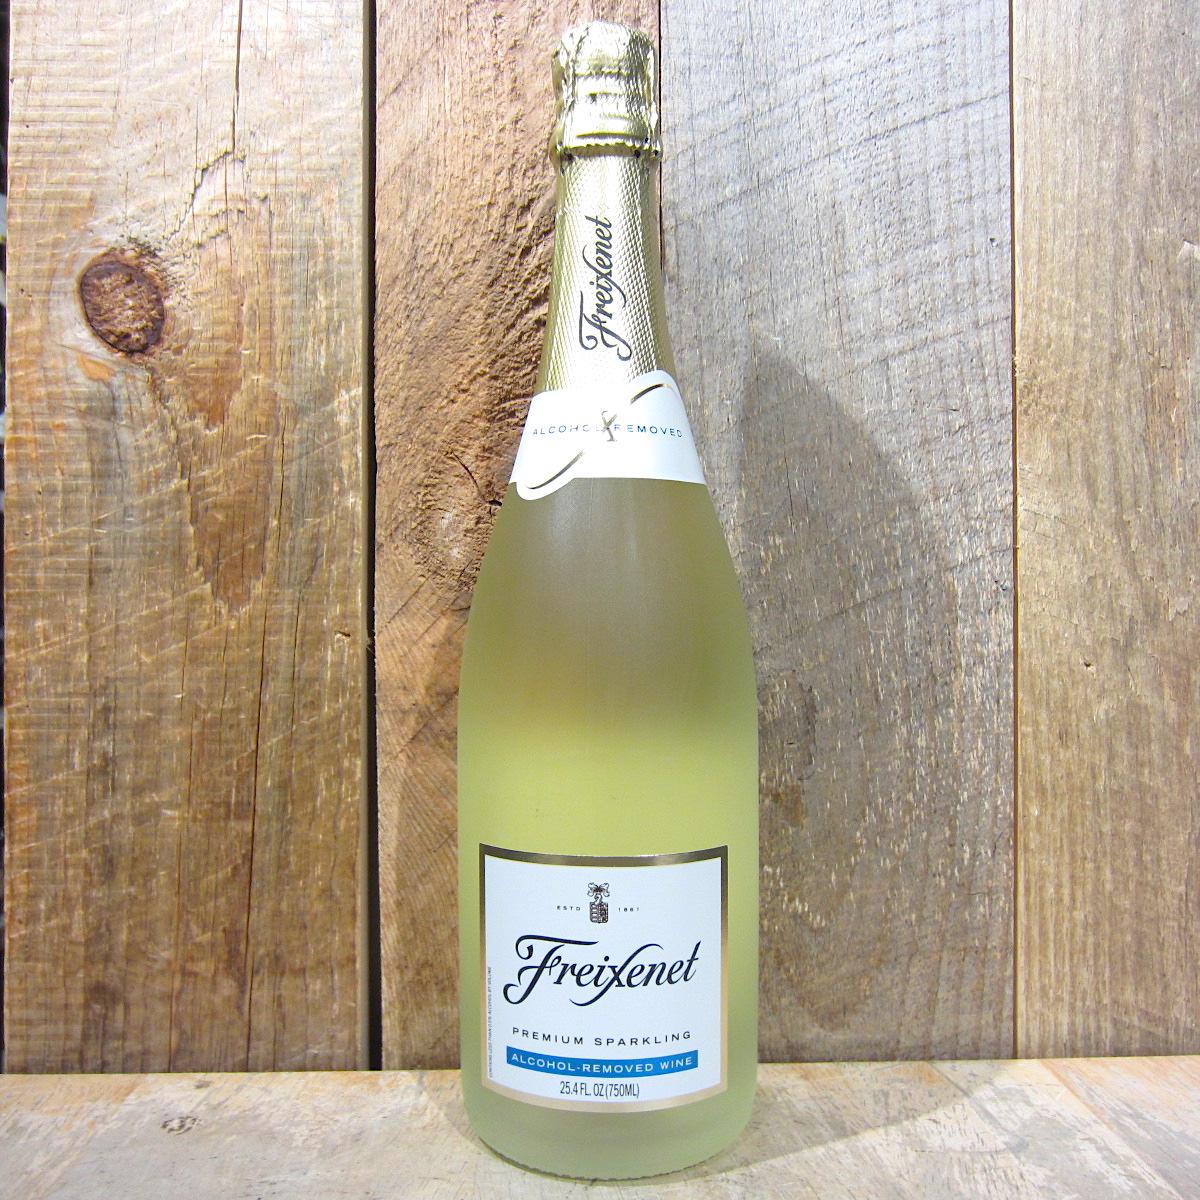 Freixenet Alcohol Removed Brut Sparkling White 750ml